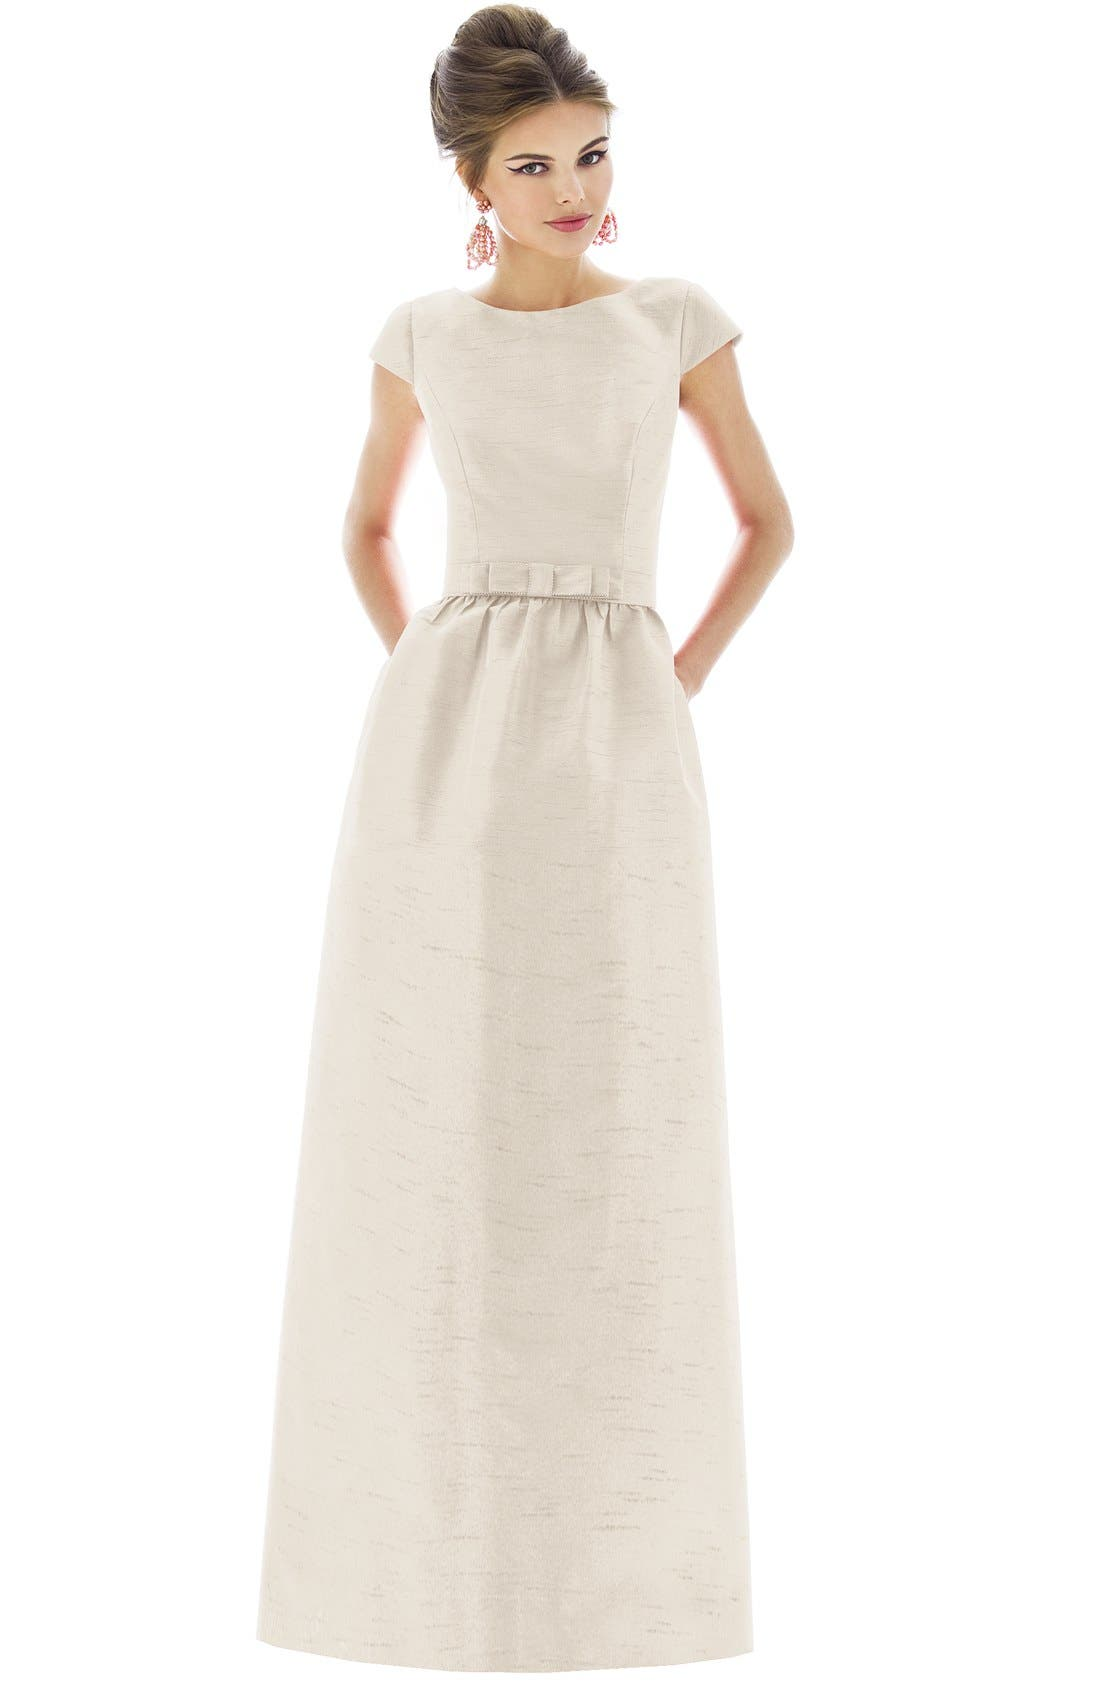 Long dupioni dress